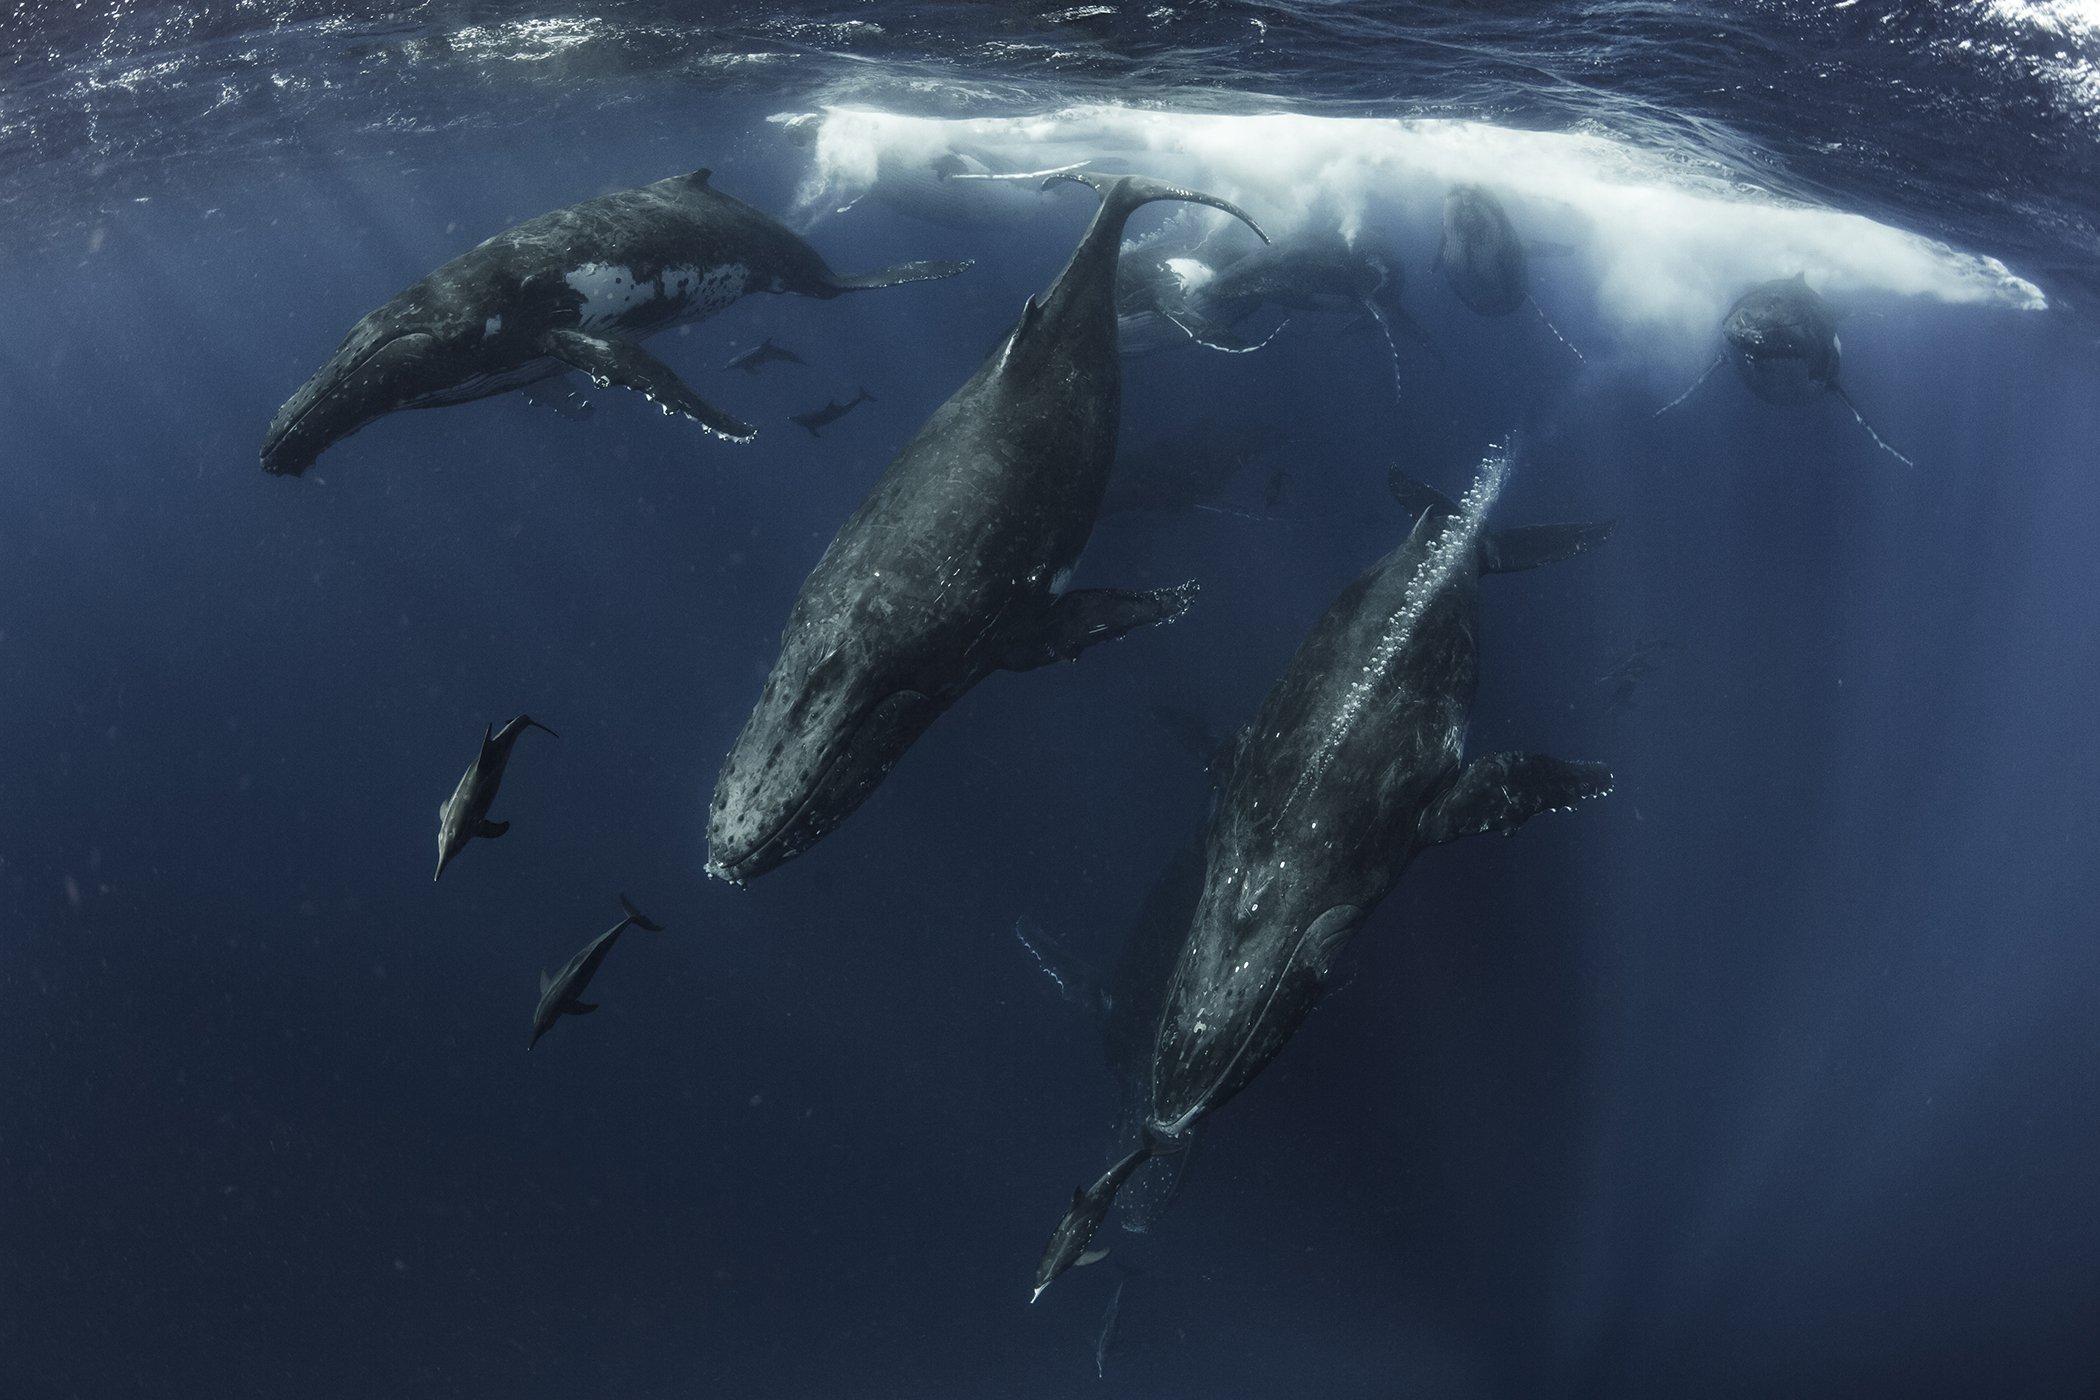 UnderwaterPhotographerOfTheYear_402ScottPortelli_006.jpg